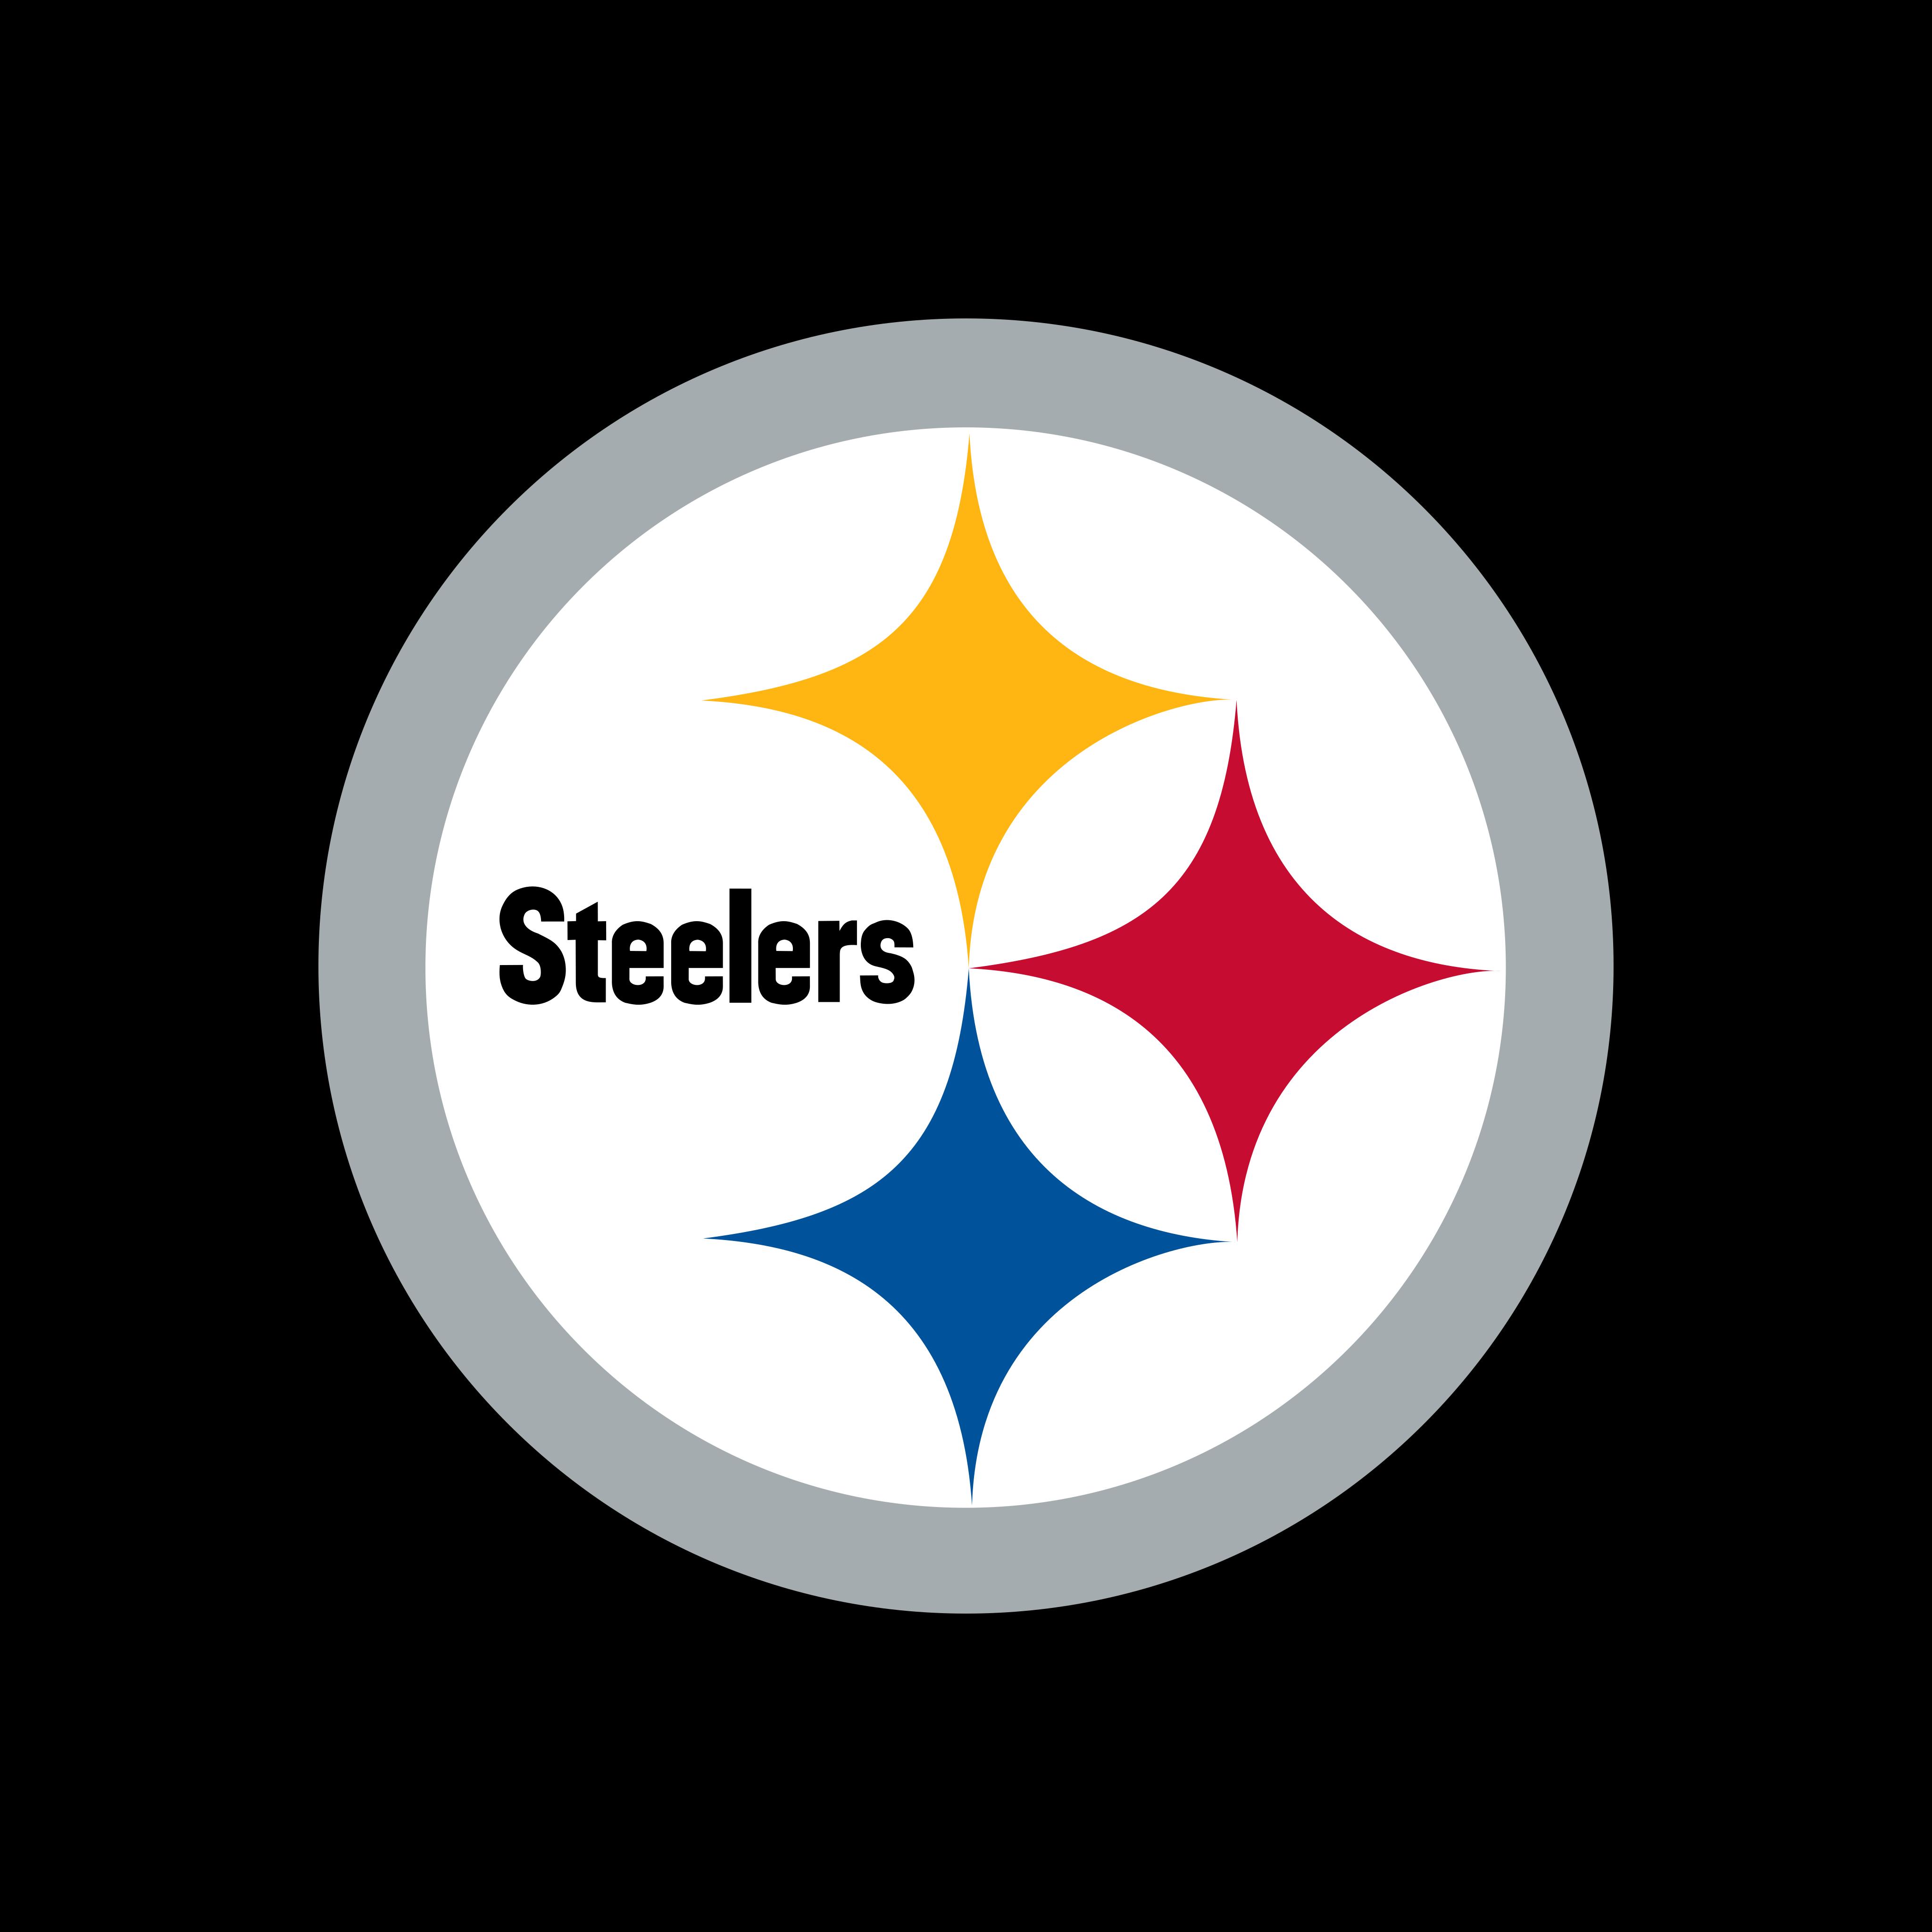 pittsburgh steelers logo 0 - Pittsburgh Steelers Logo